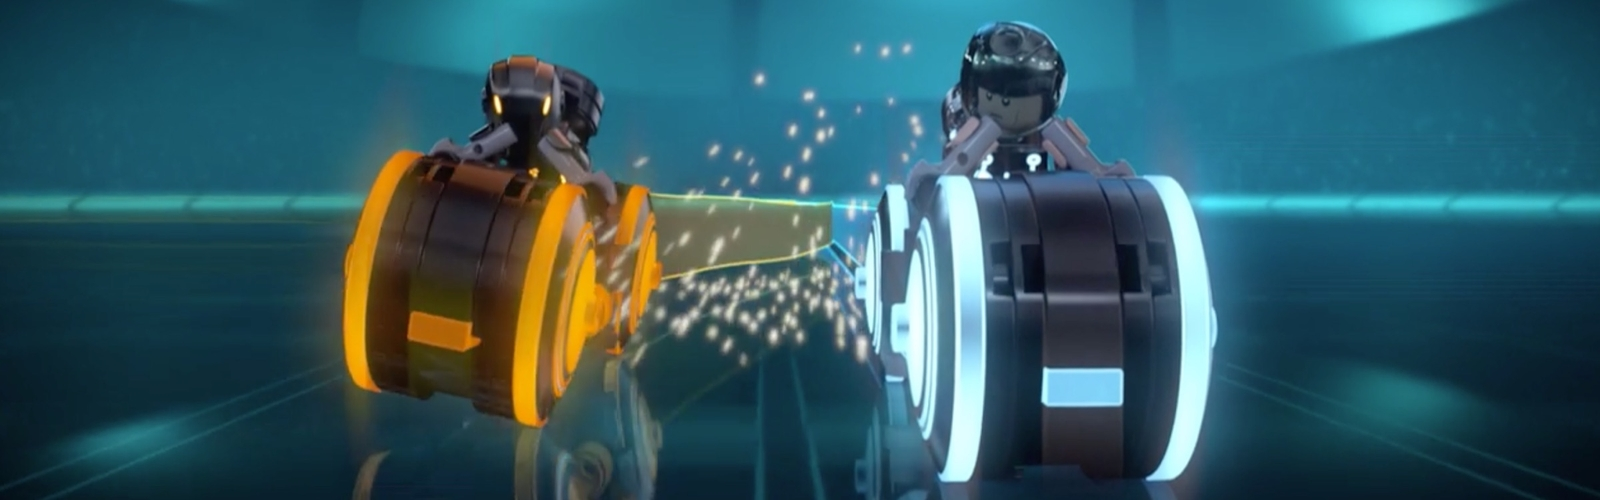 LEGO Ideas - Tron: Legacy Article   Official LEGO® Shop PT